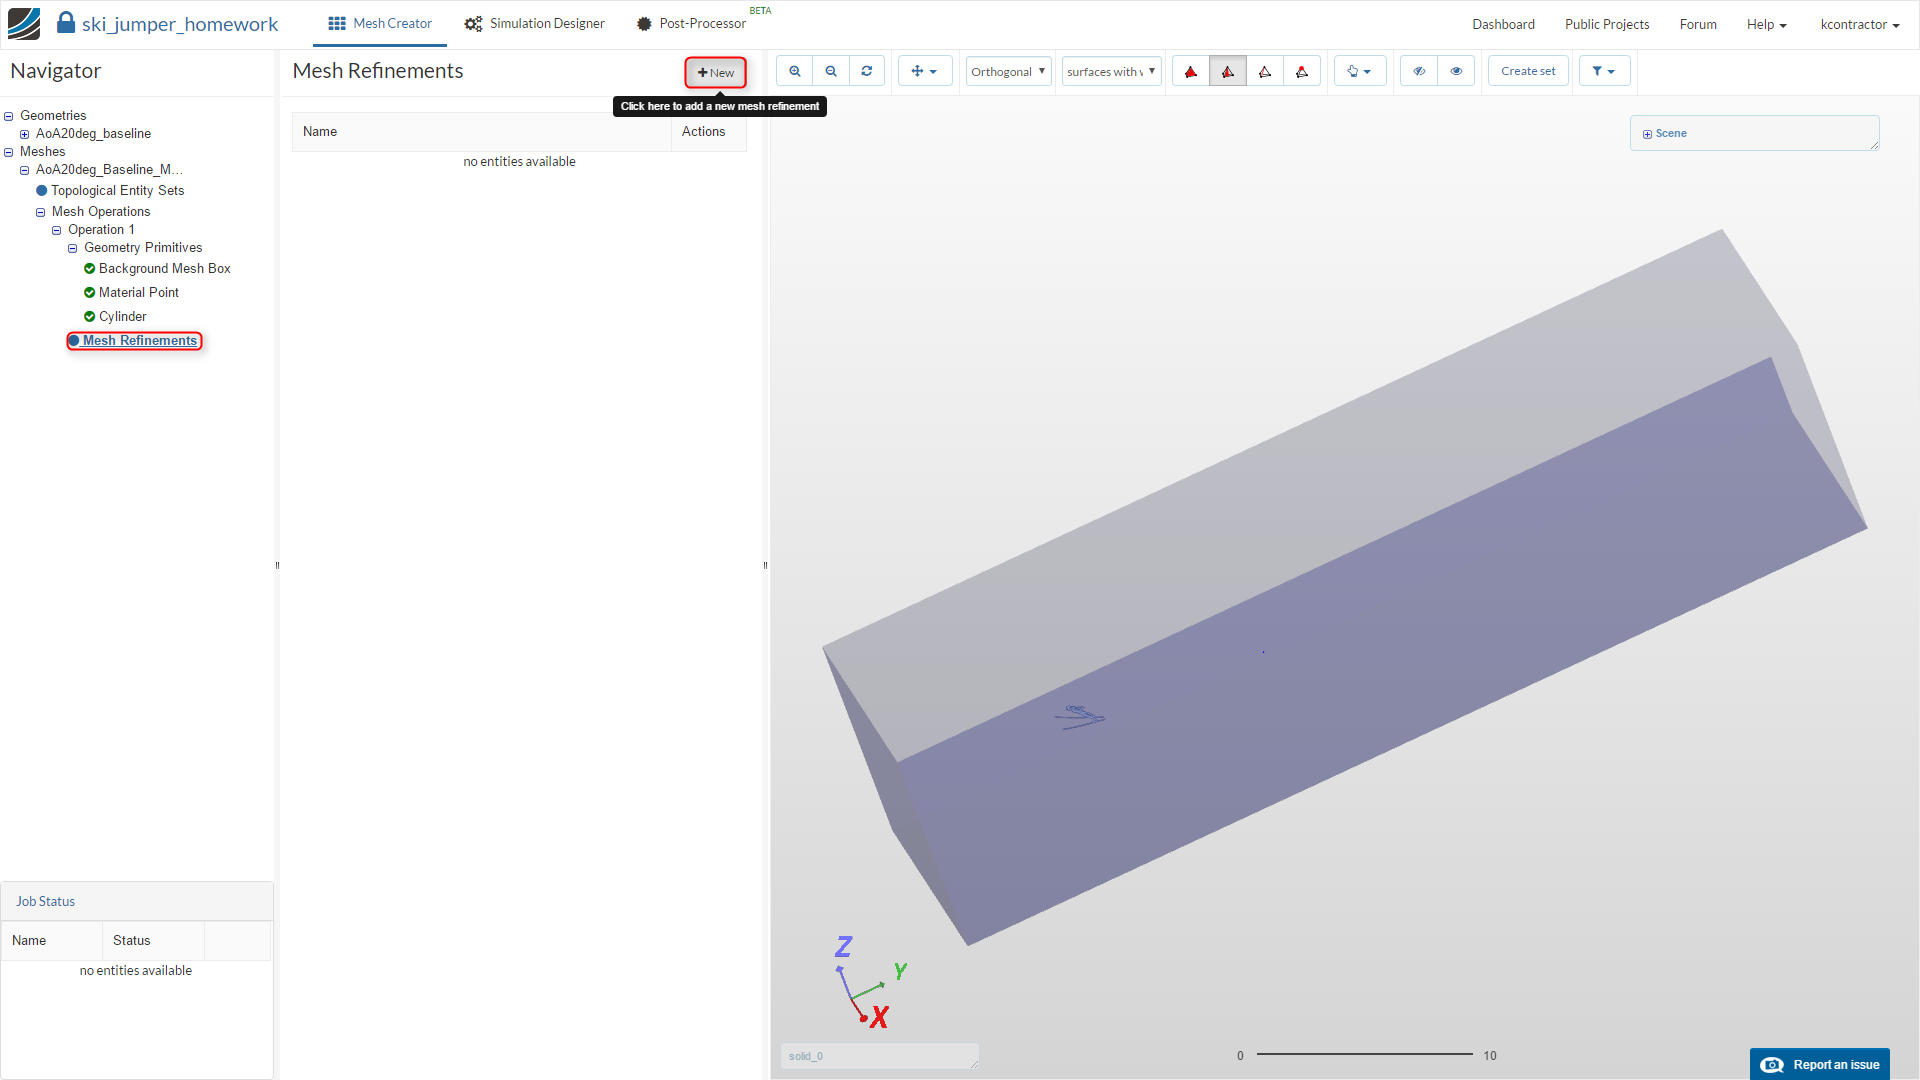 sports aerodynamics workshop homework step-by-step tutorial, meshing, mesh refinement